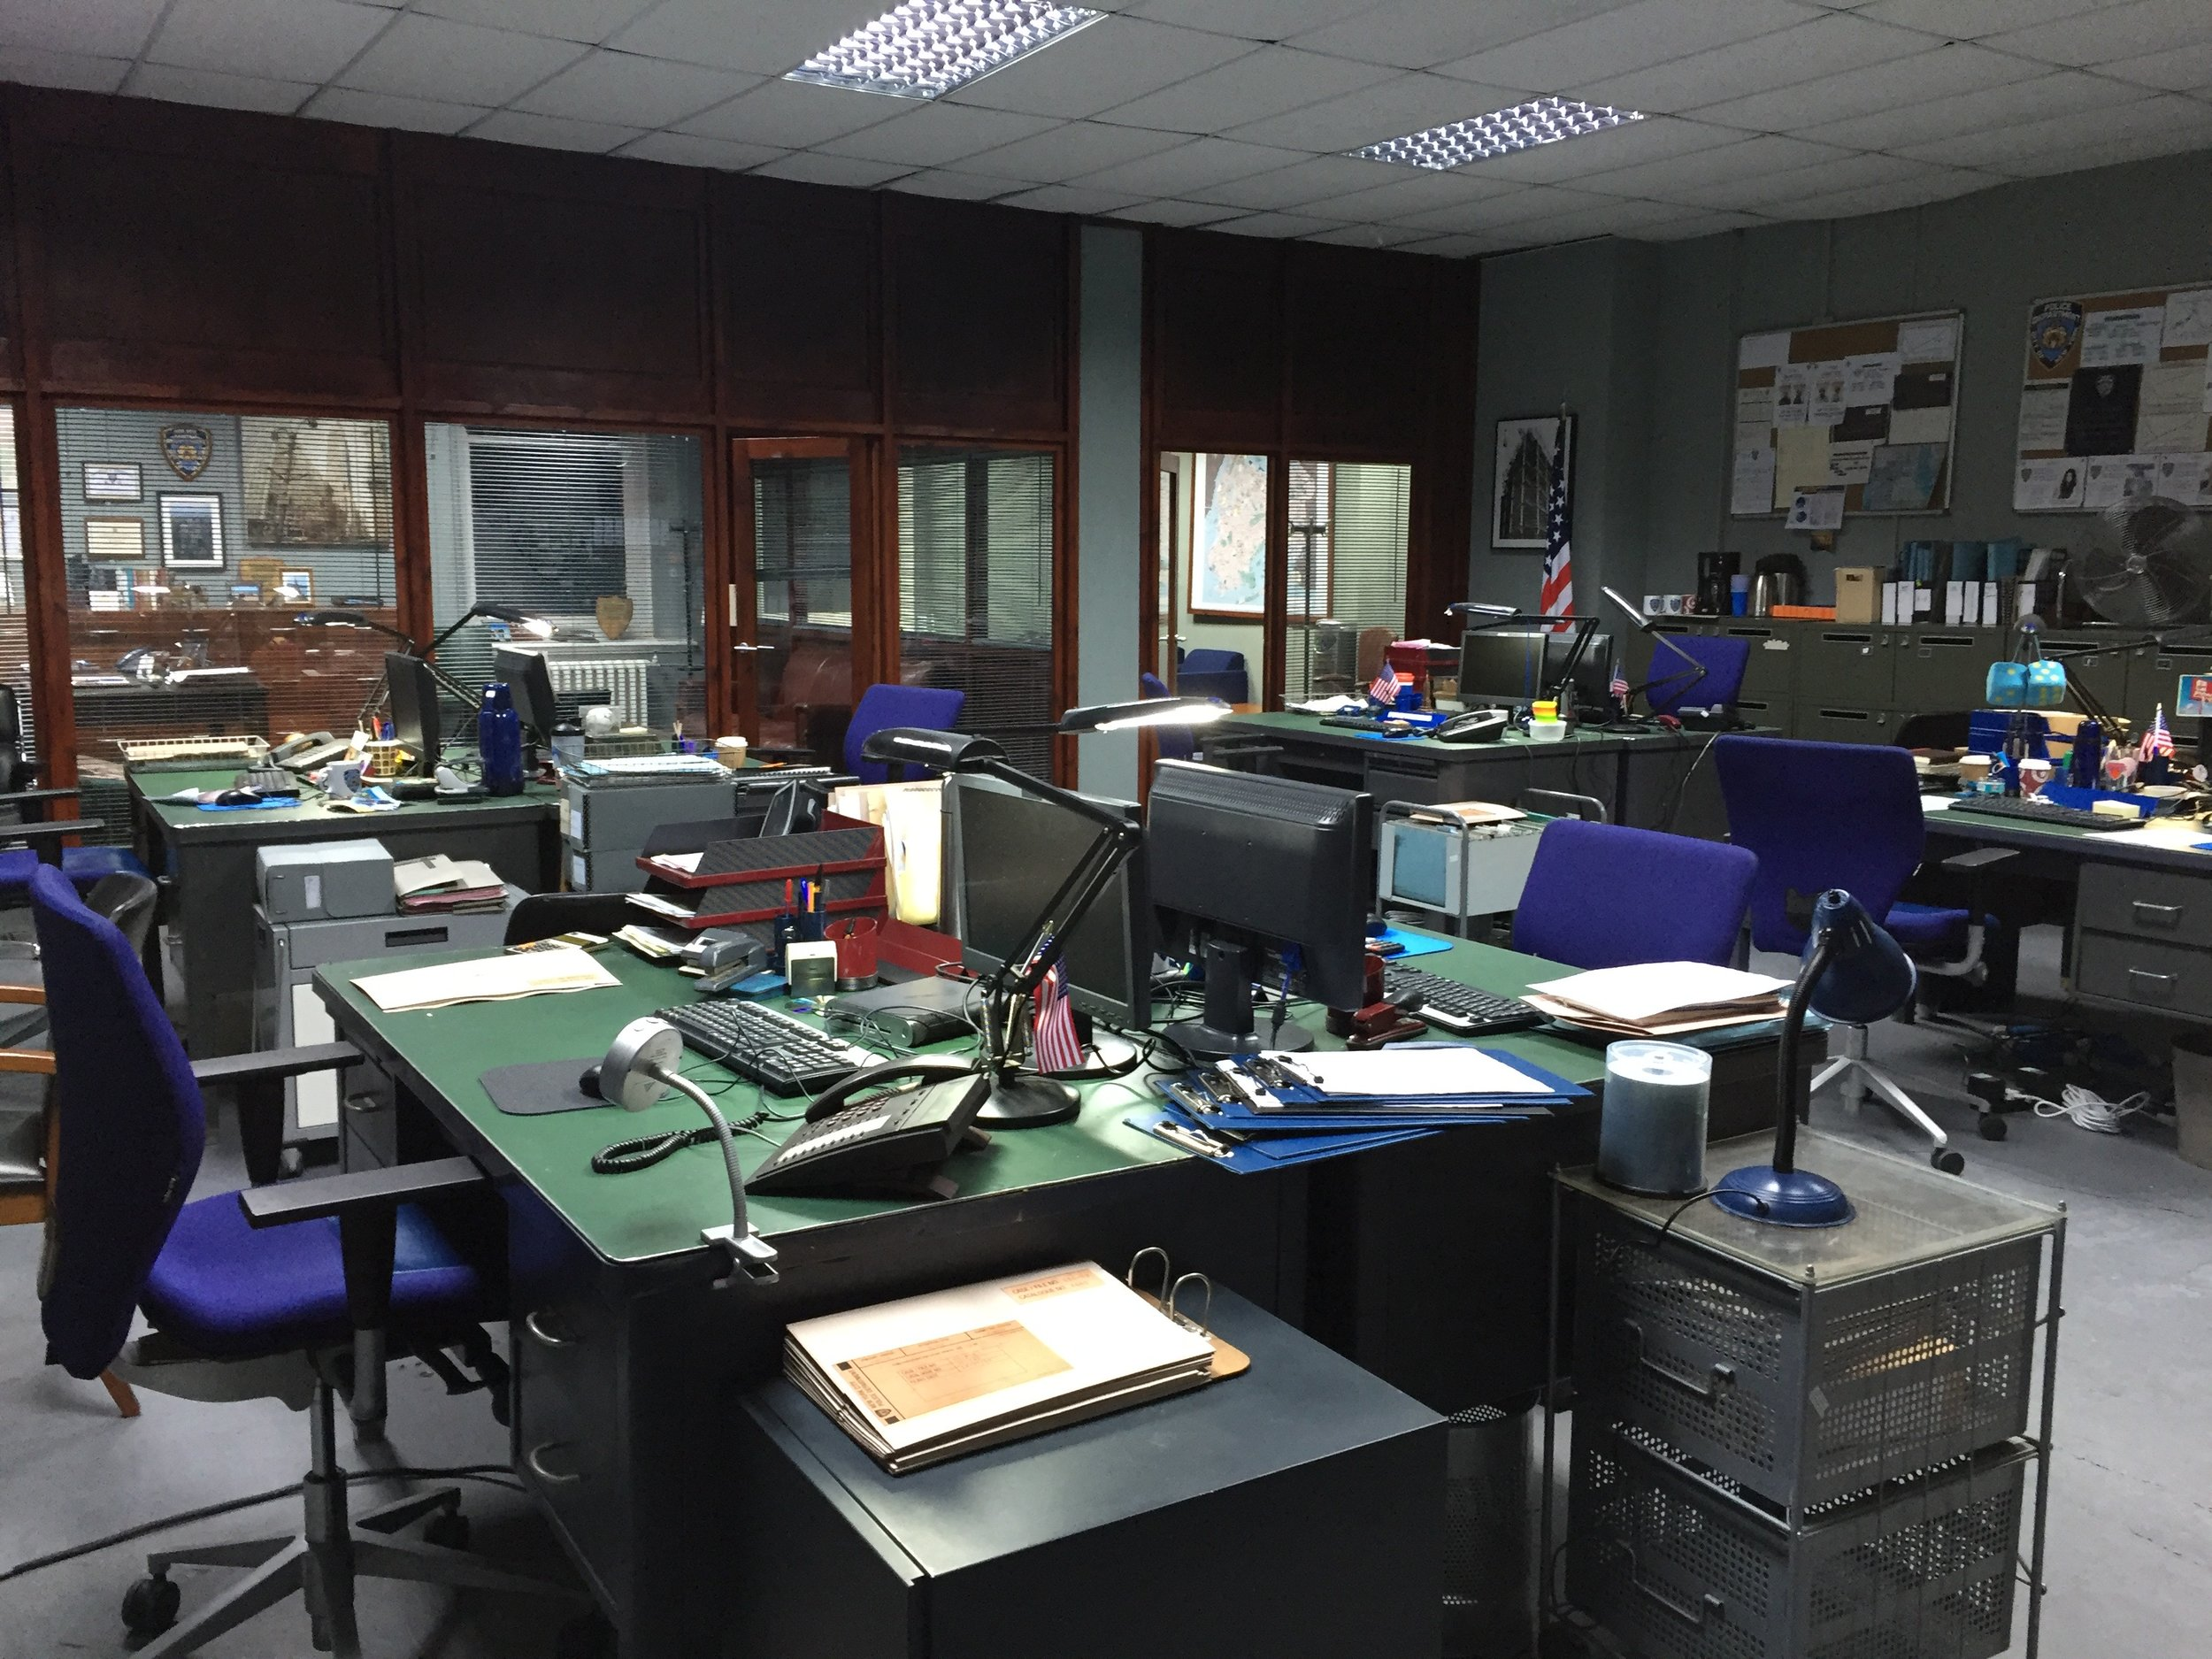 police station 1.jpg